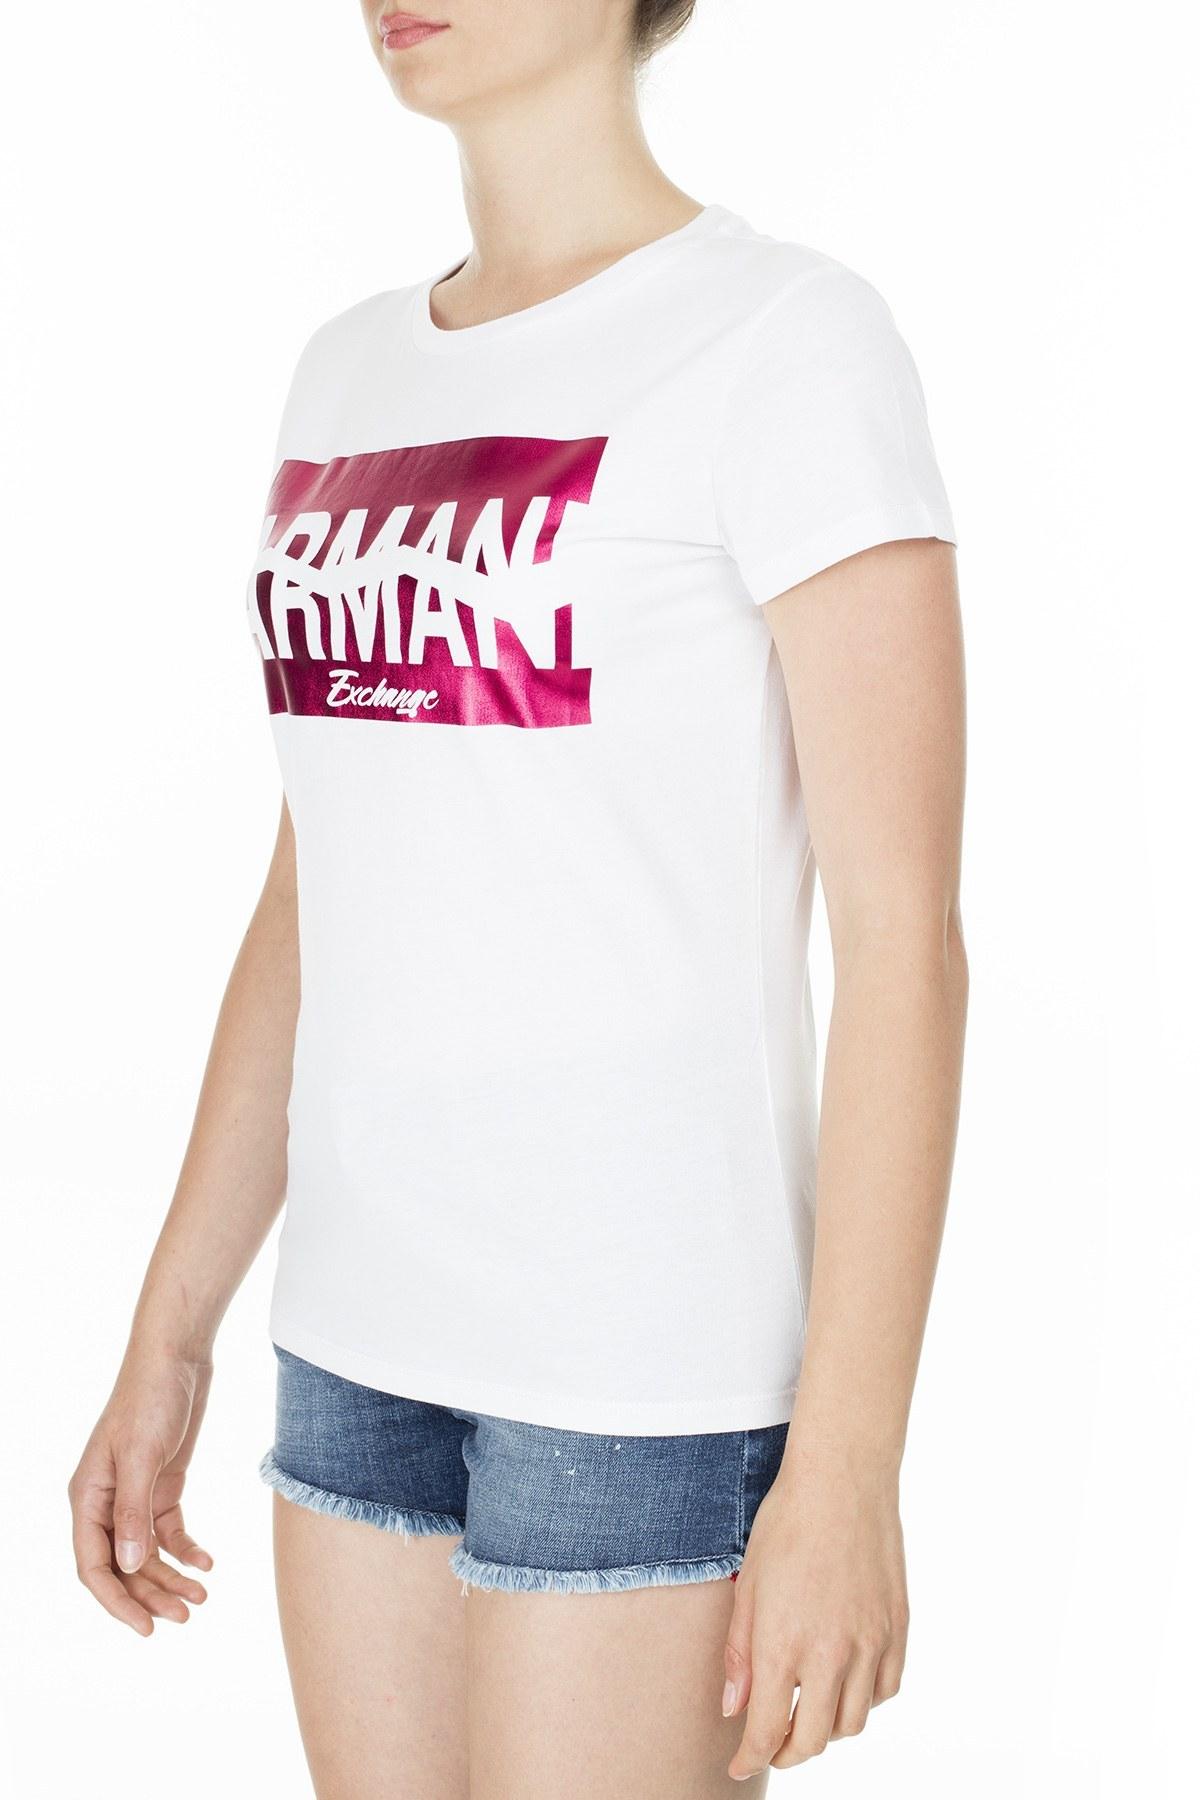 Armani Exchange Kadın T Shirt S 6GYTAB YJG3Z 1000 KIRIK BEYAZ